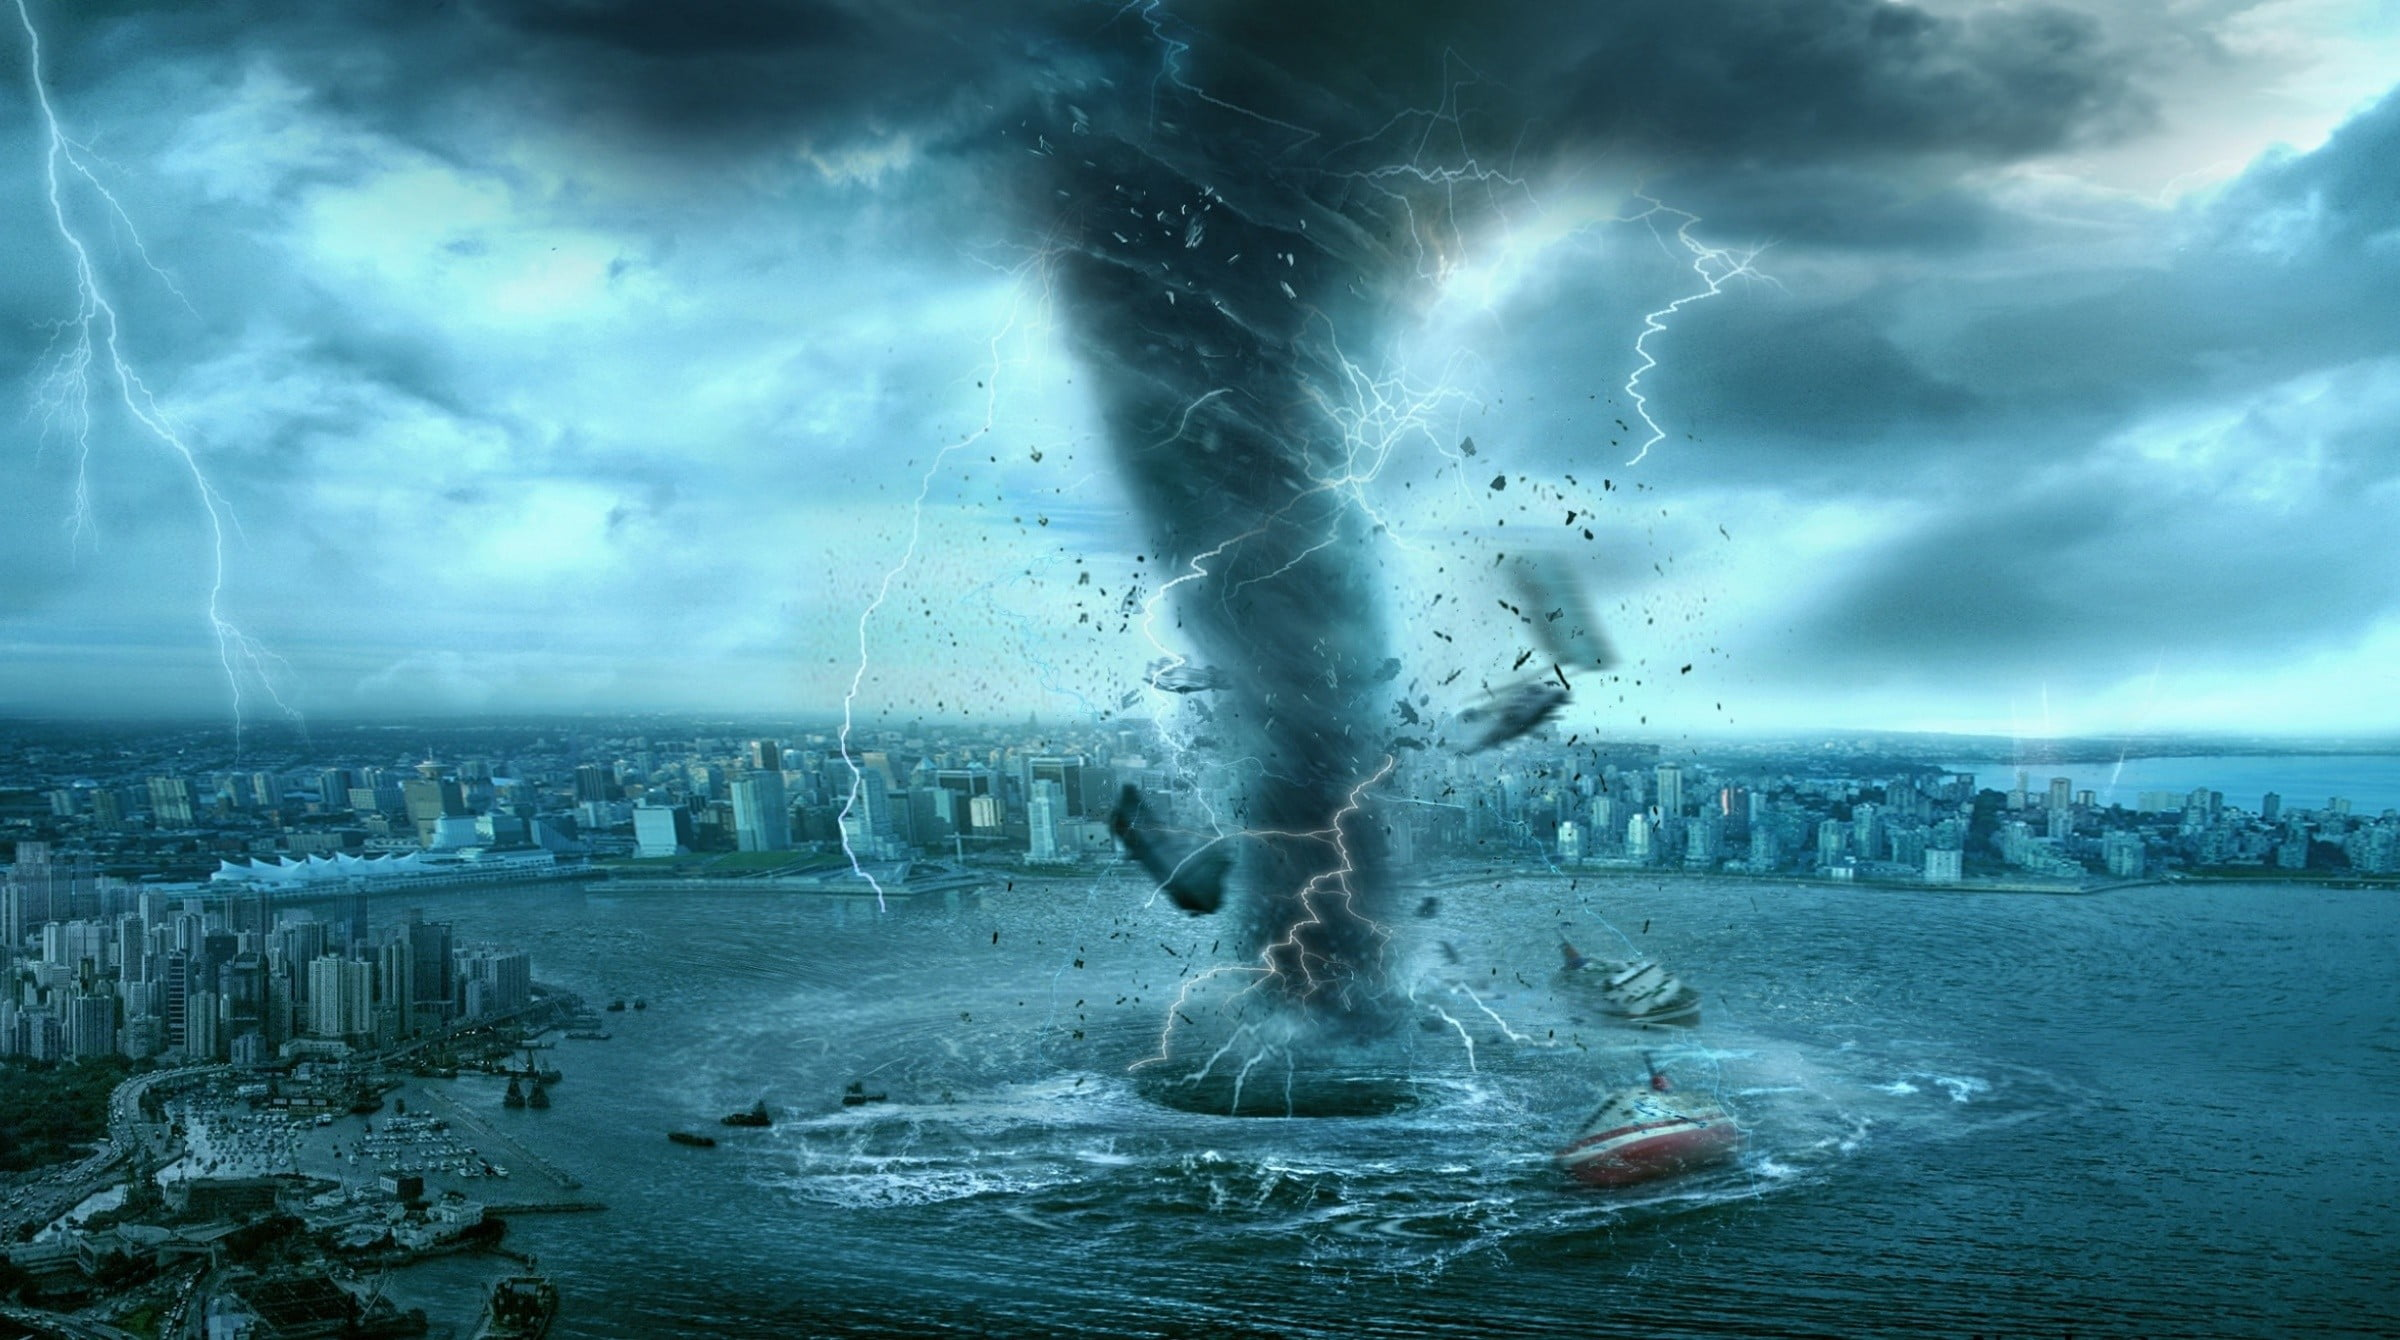 Tornado Hd 2834090 Hd Wallpaper Backgrounds Download